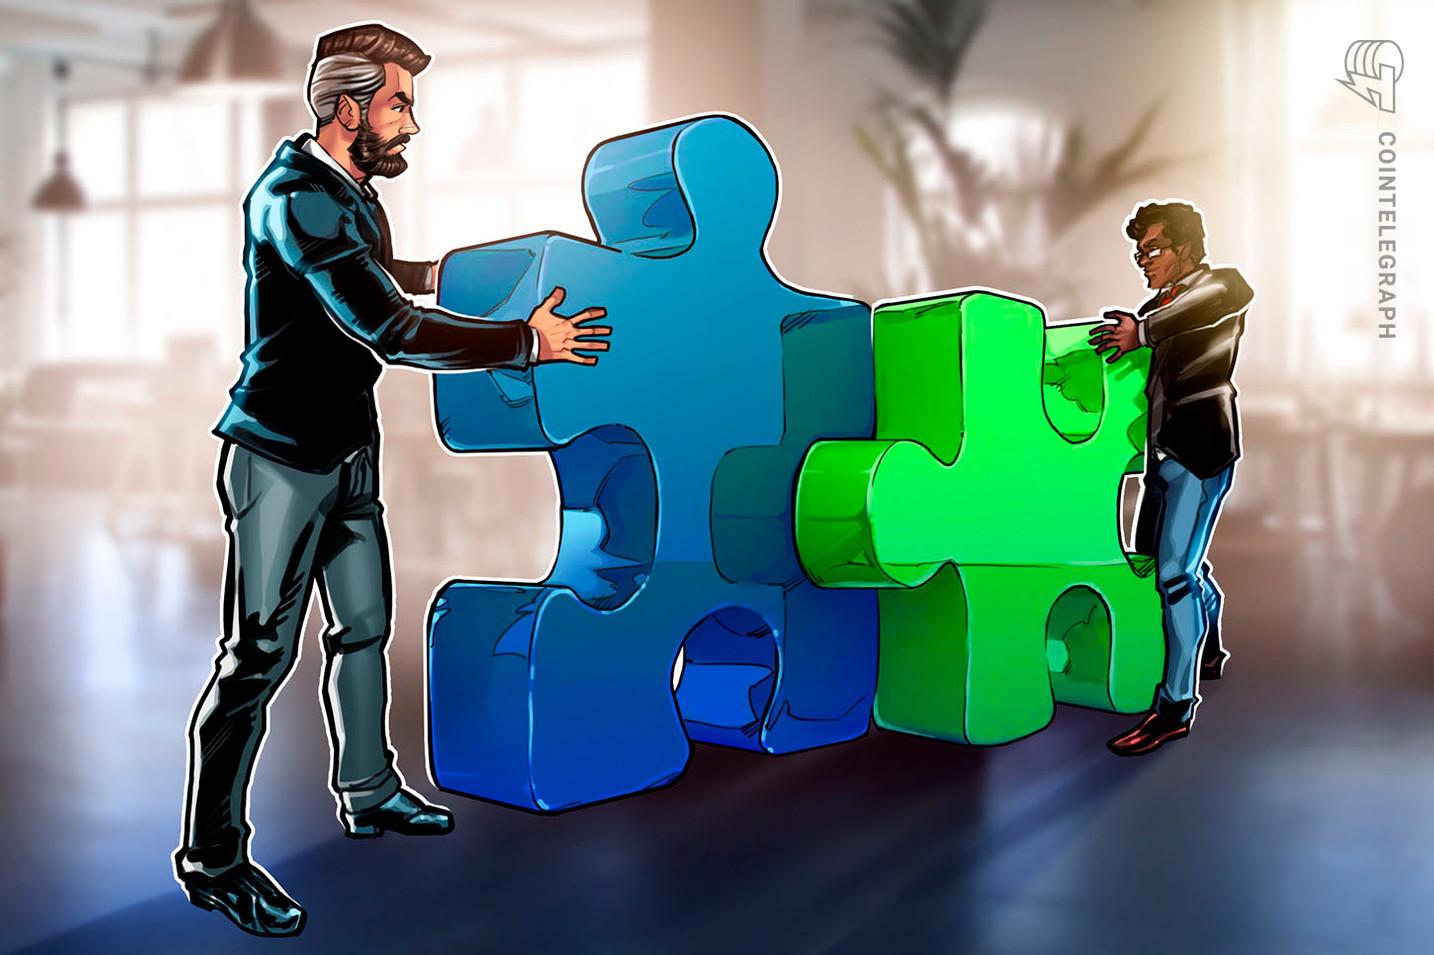 BitFlyer e Tpoint Japan se unem para oferecer programa de fidelidade Bitcoin